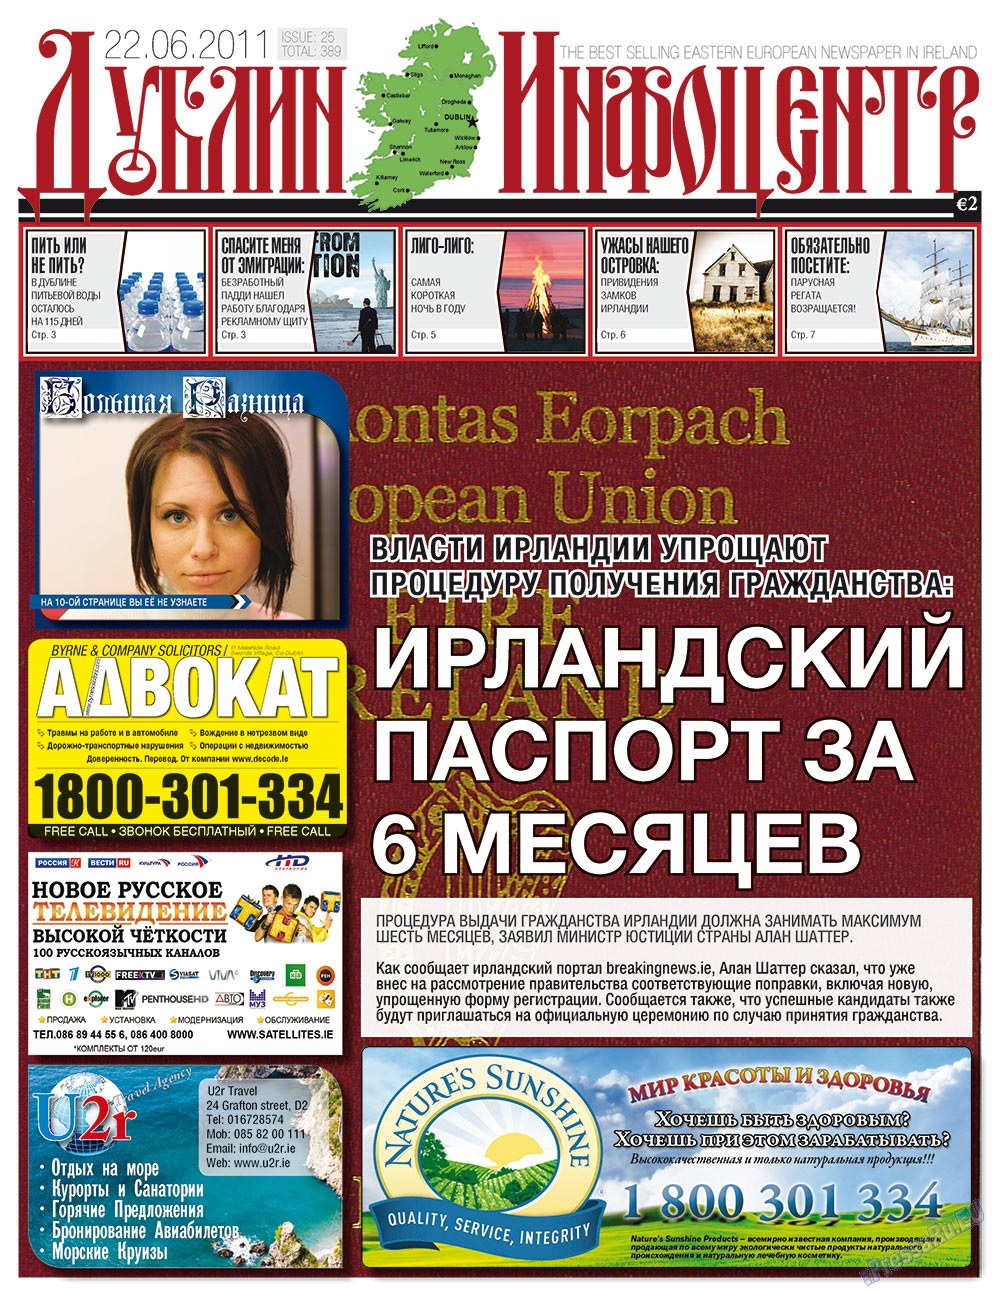 Дублин инфоцентр (газета). 2011 год, номер 25, стр. 1